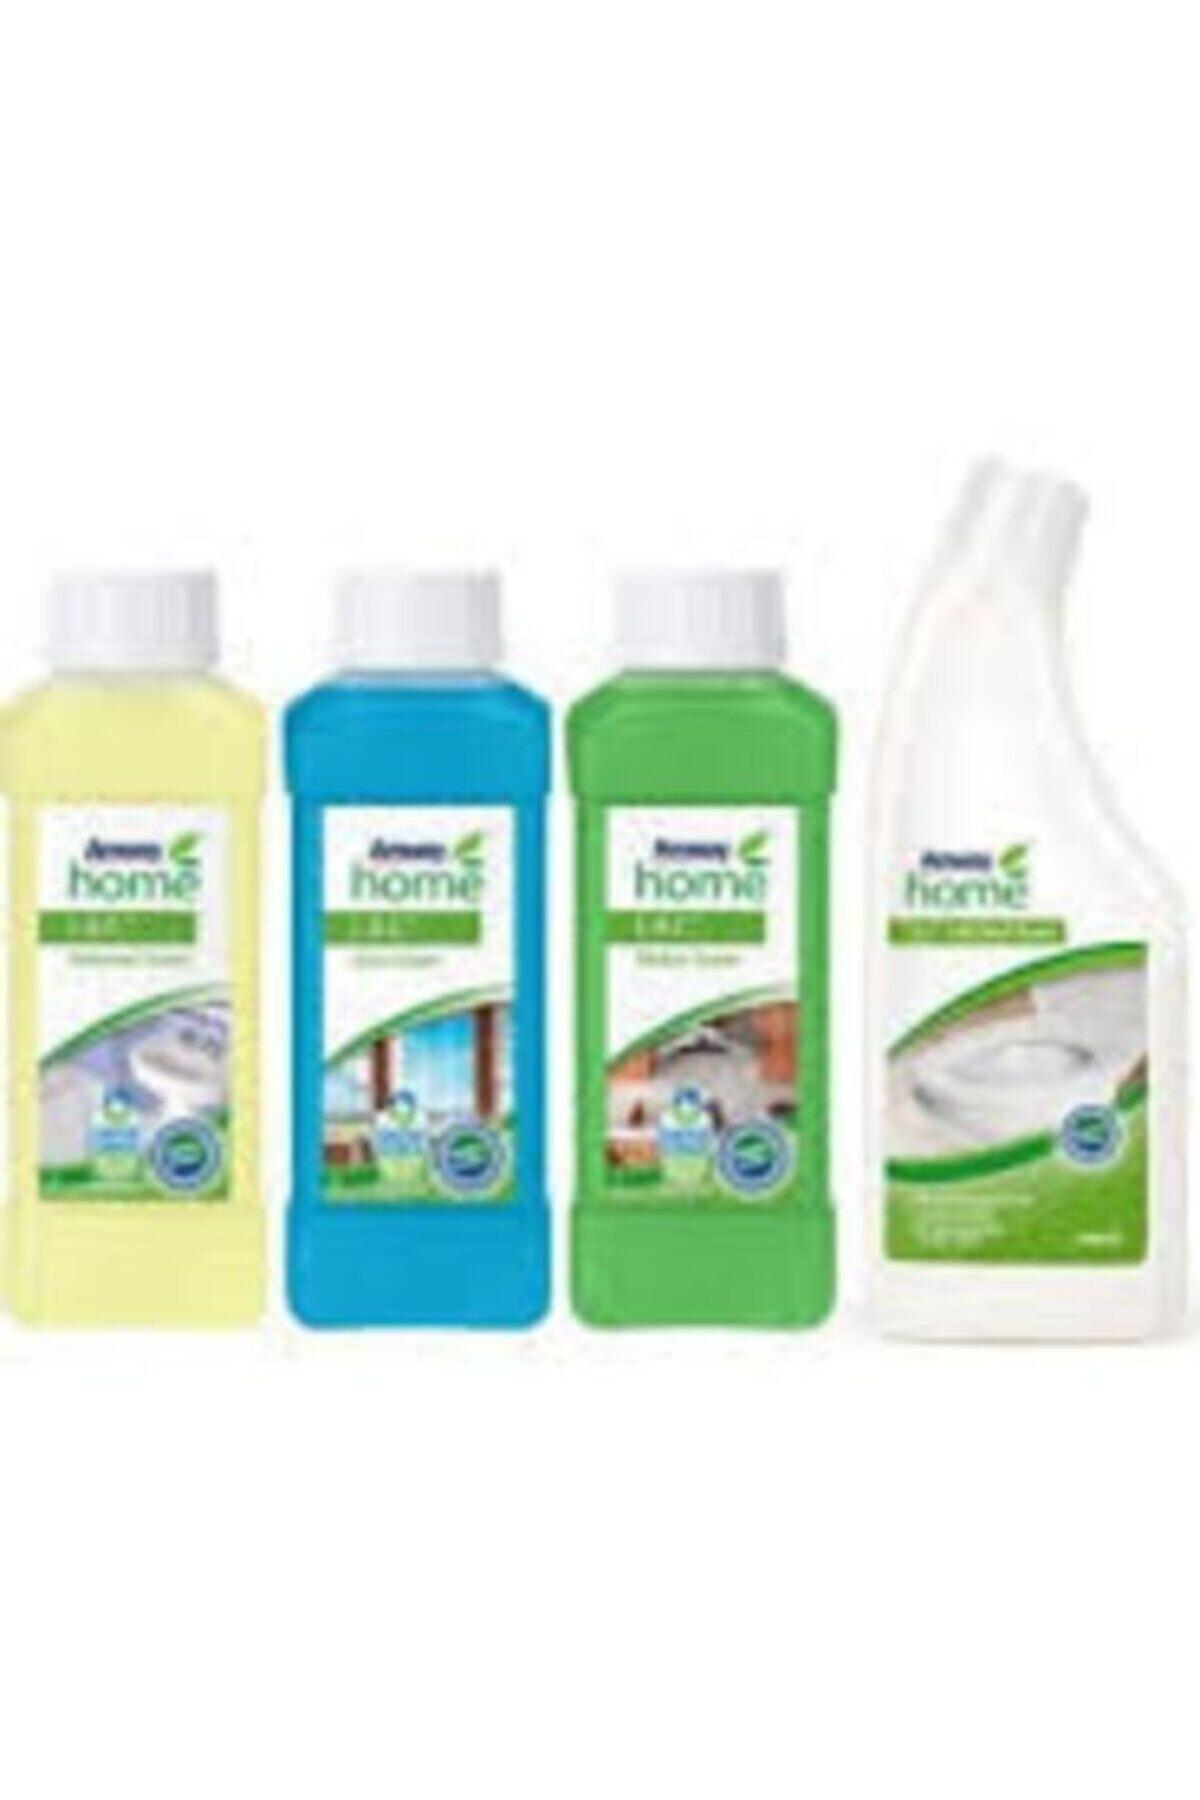 Amway Mutfak Temizleyici Home™ L.o.c.™toilet Bowl Cleaner -tuvalet Temizleyicisi Home™ L.o.c.™ 2